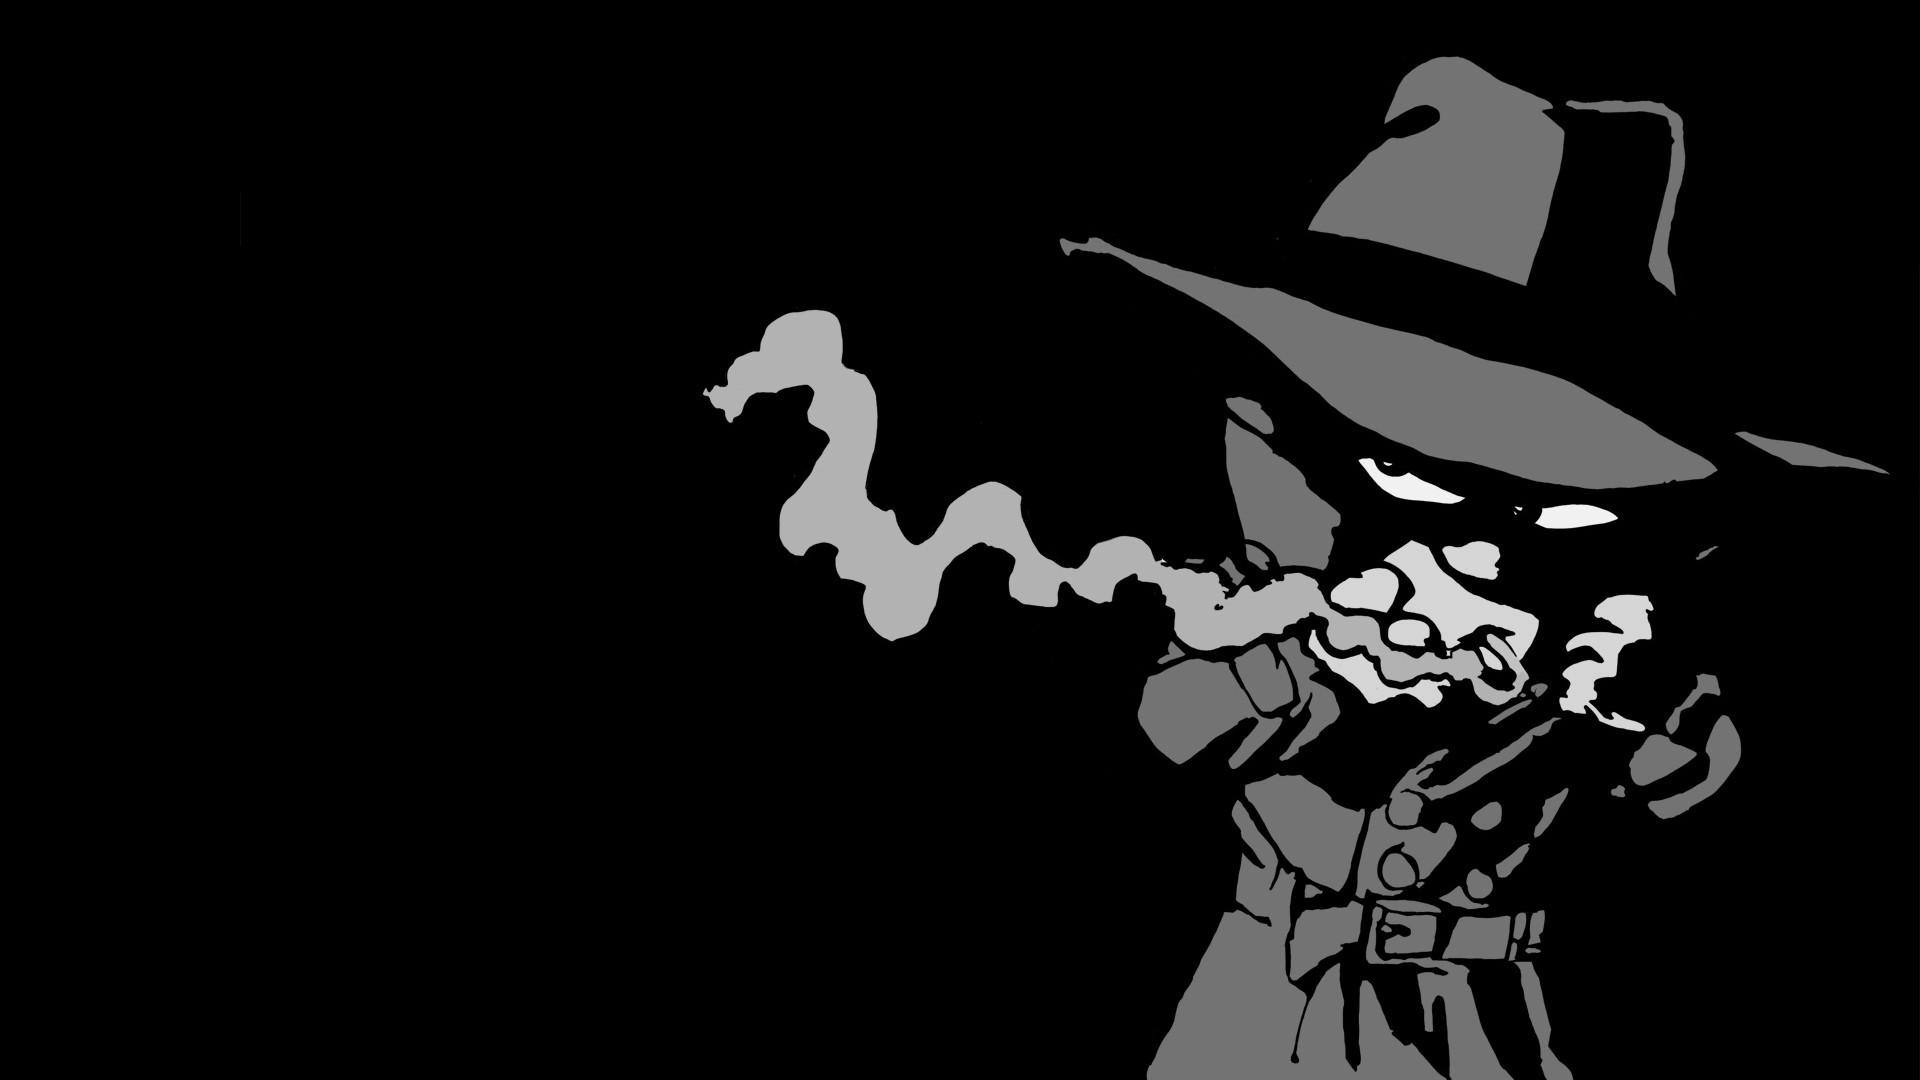 Detective Calvin [1920×1080] alternate wallpapers: 1 2